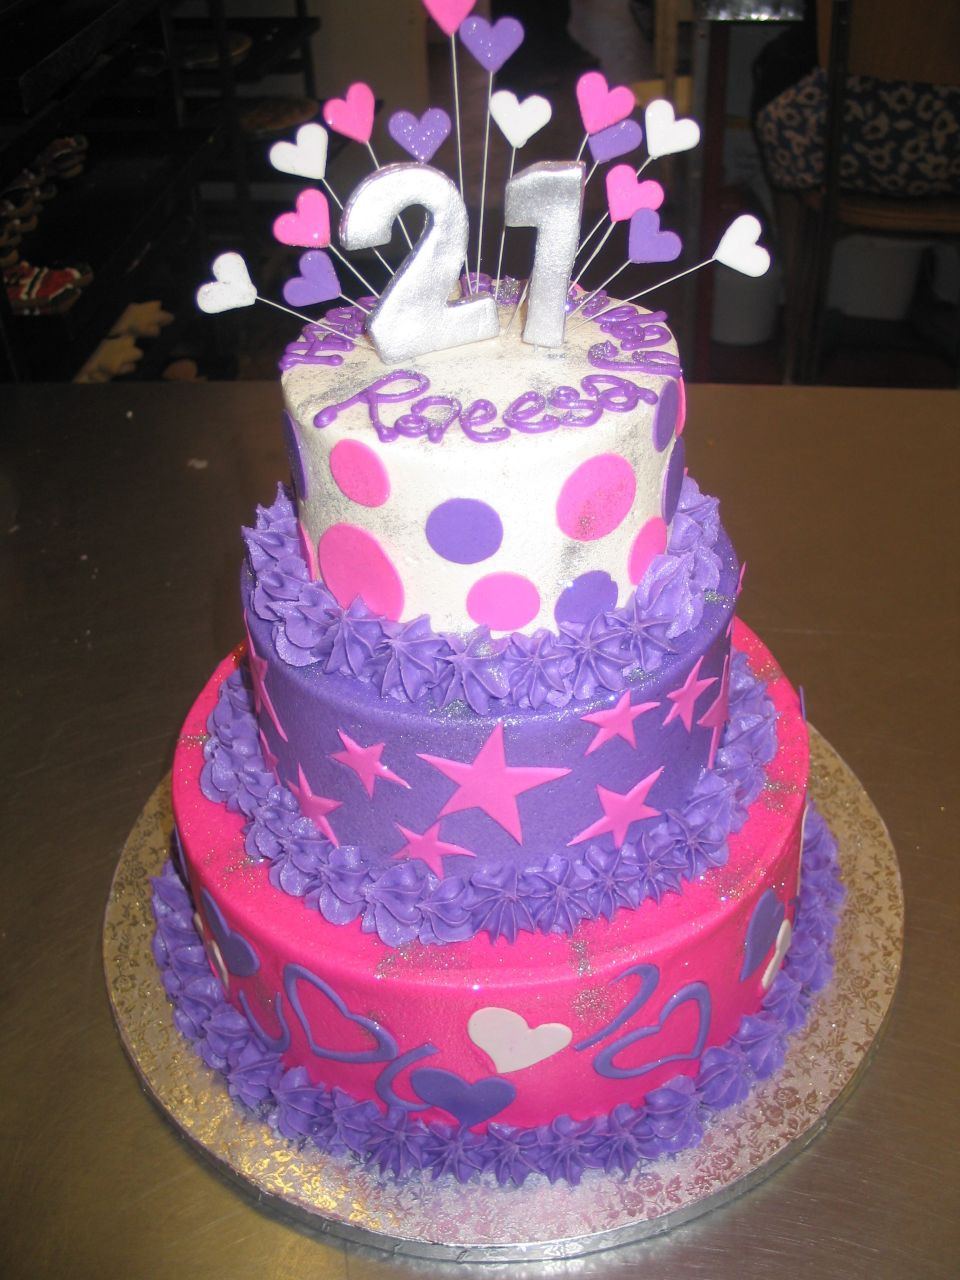 Birthday Cake Designs  21st Birthday Cakes – Decoration Ideas